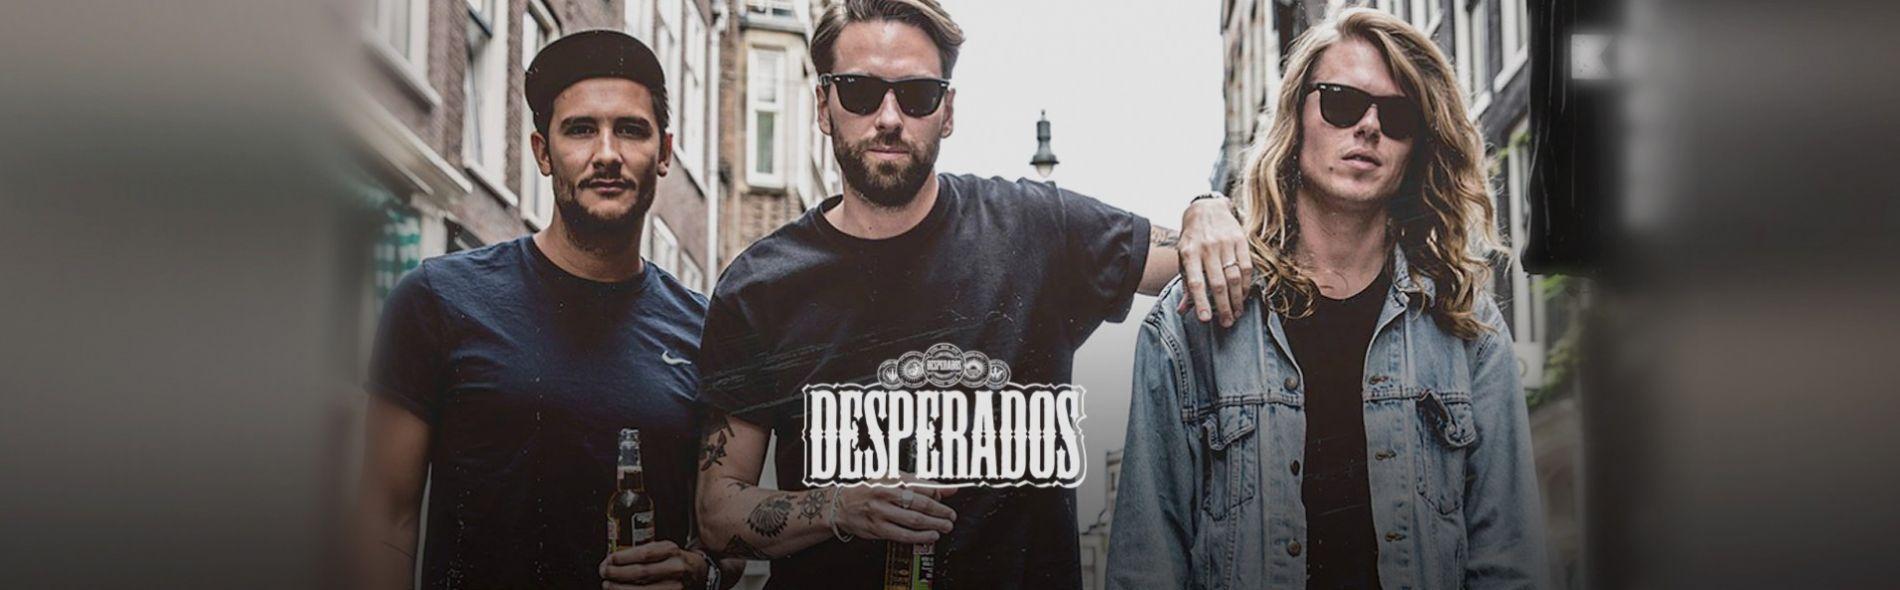 5 years Kris Kross Amsterdam documentary by Desperados